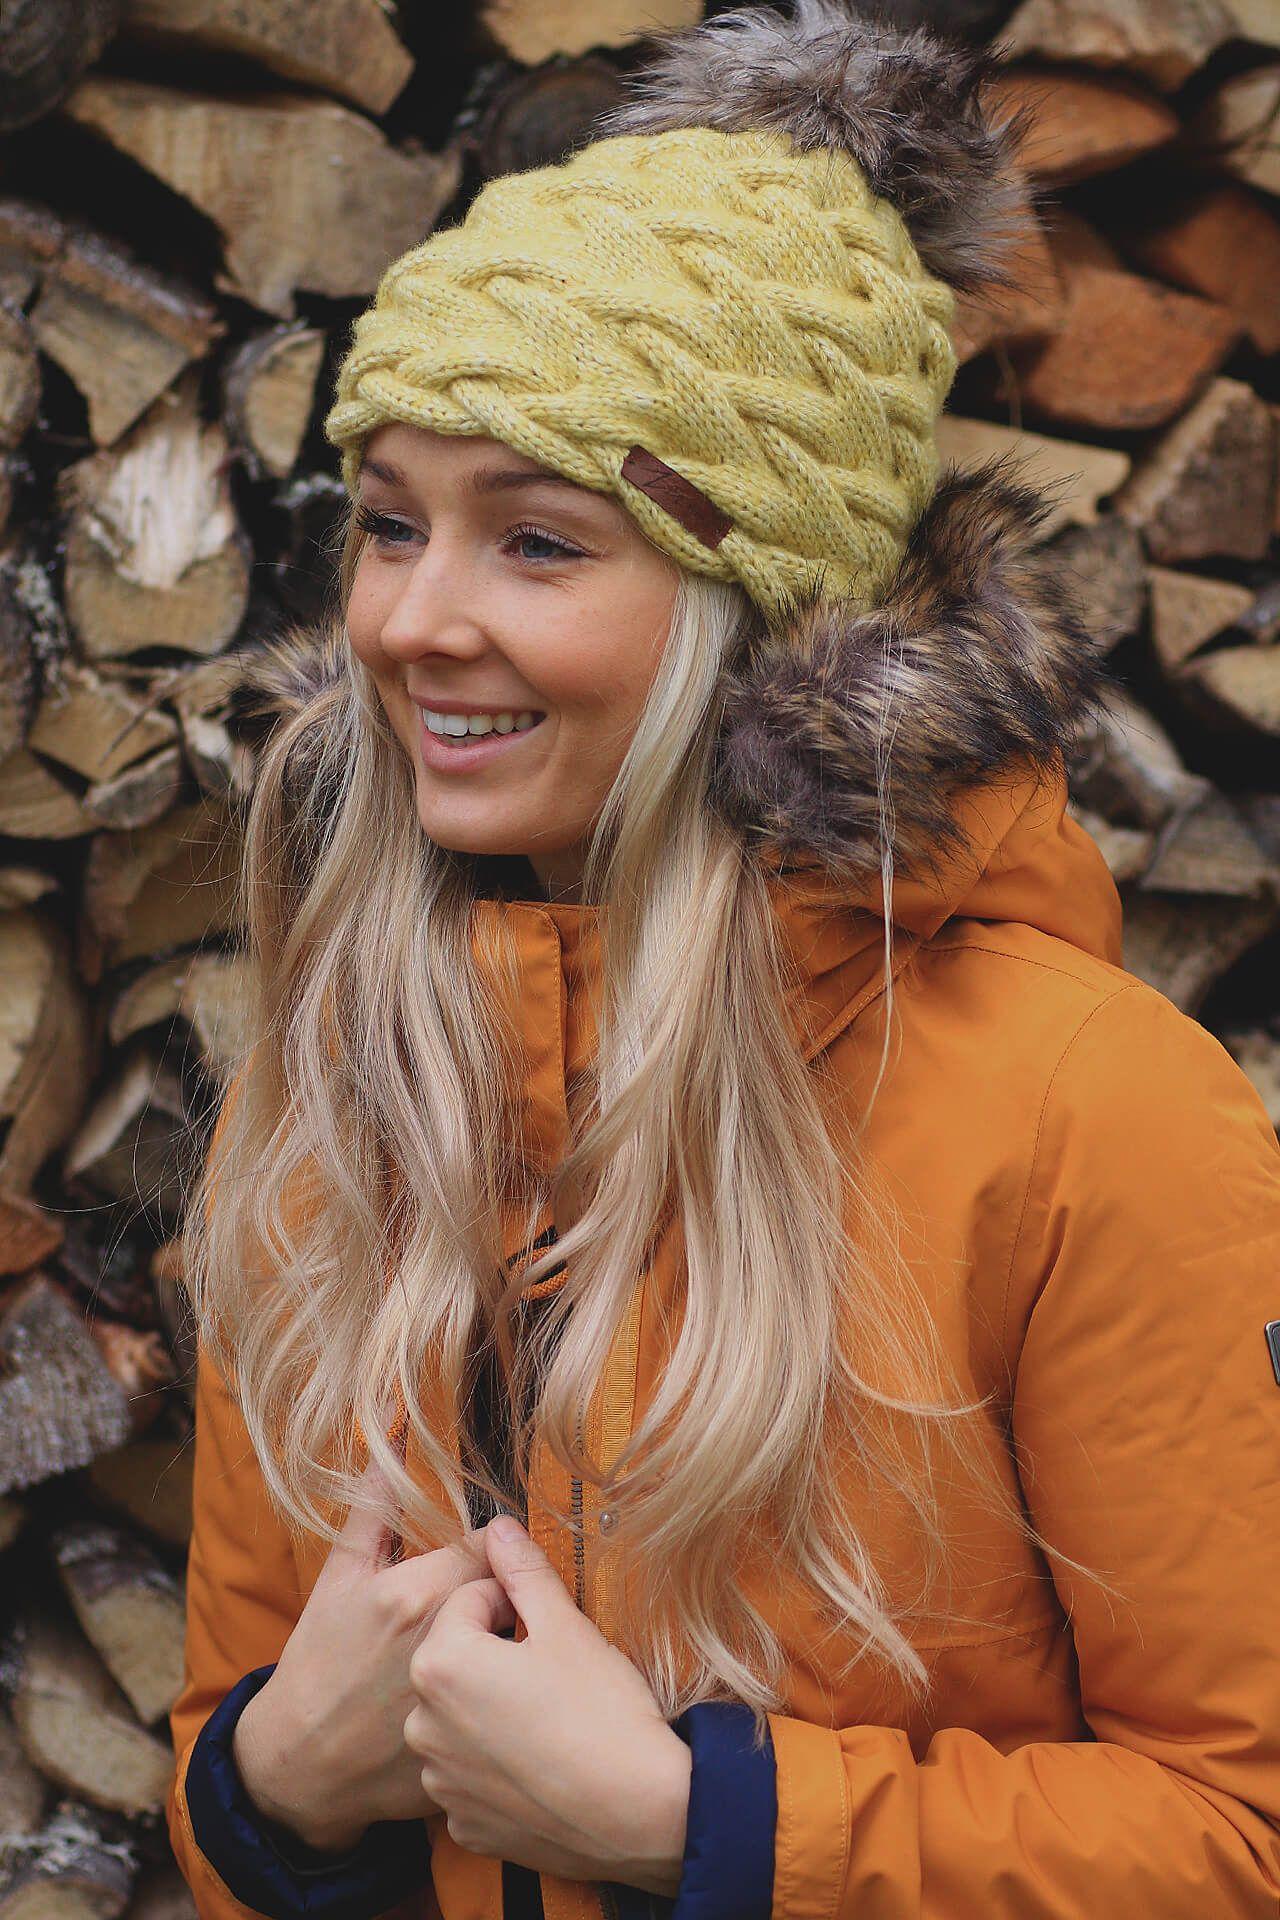 81811dfffec Hat - handmade   merino  winter  yellow  parka  jacket  hat  autumn  fall   blonde  girl  fashion  outfit  2016  2017  trendy  handknitted  handmade   wool   ...